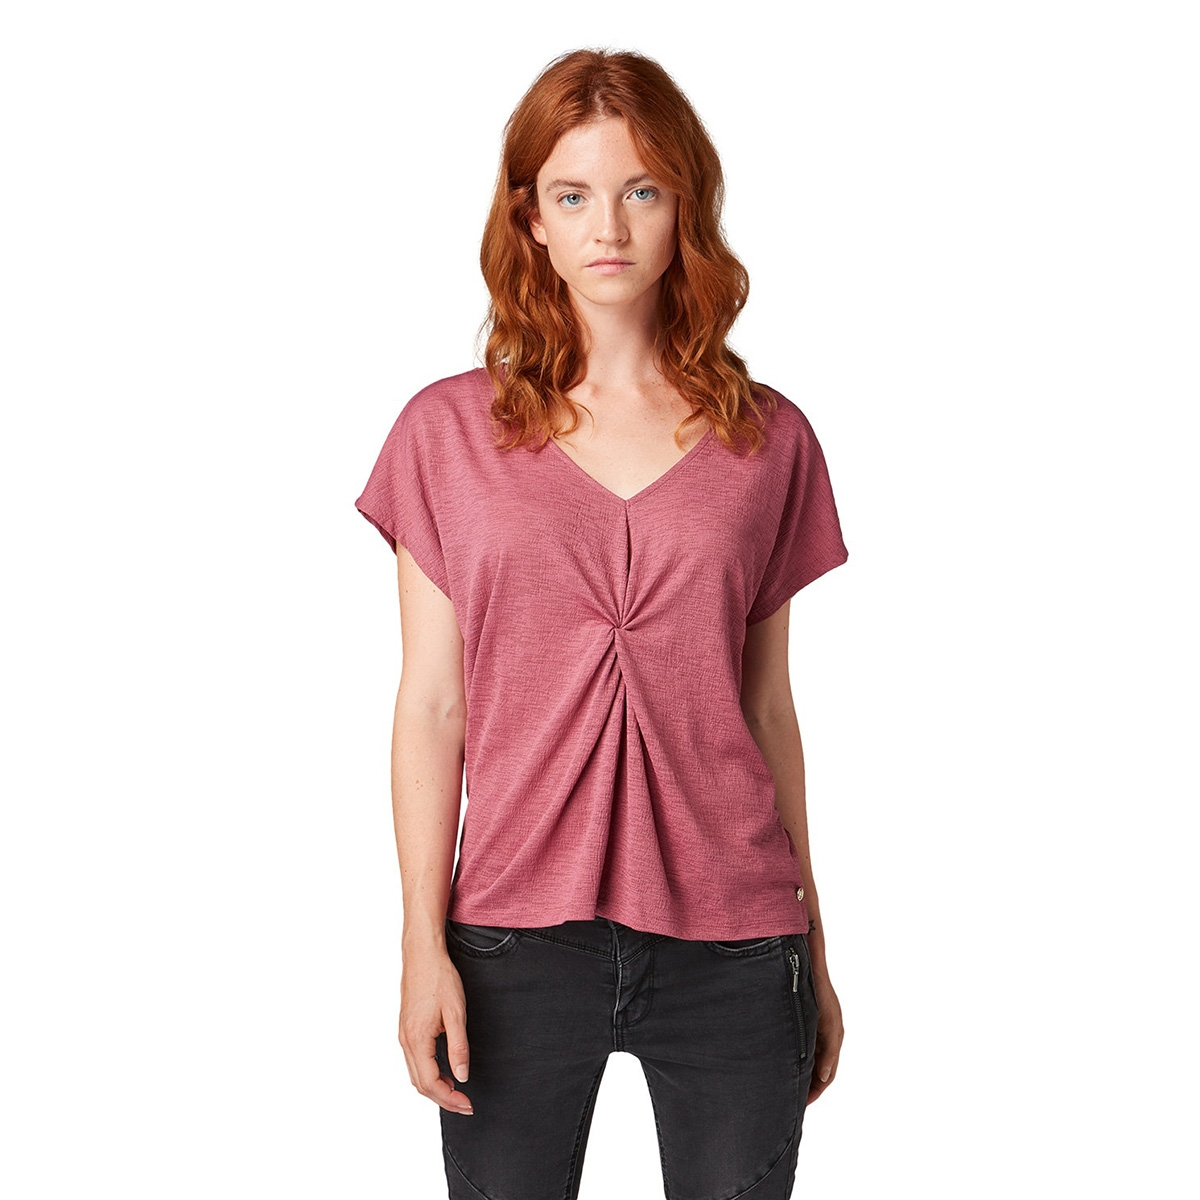 t shirt met knoopdetail 1013466xx71 tom tailor t-shirt 19397